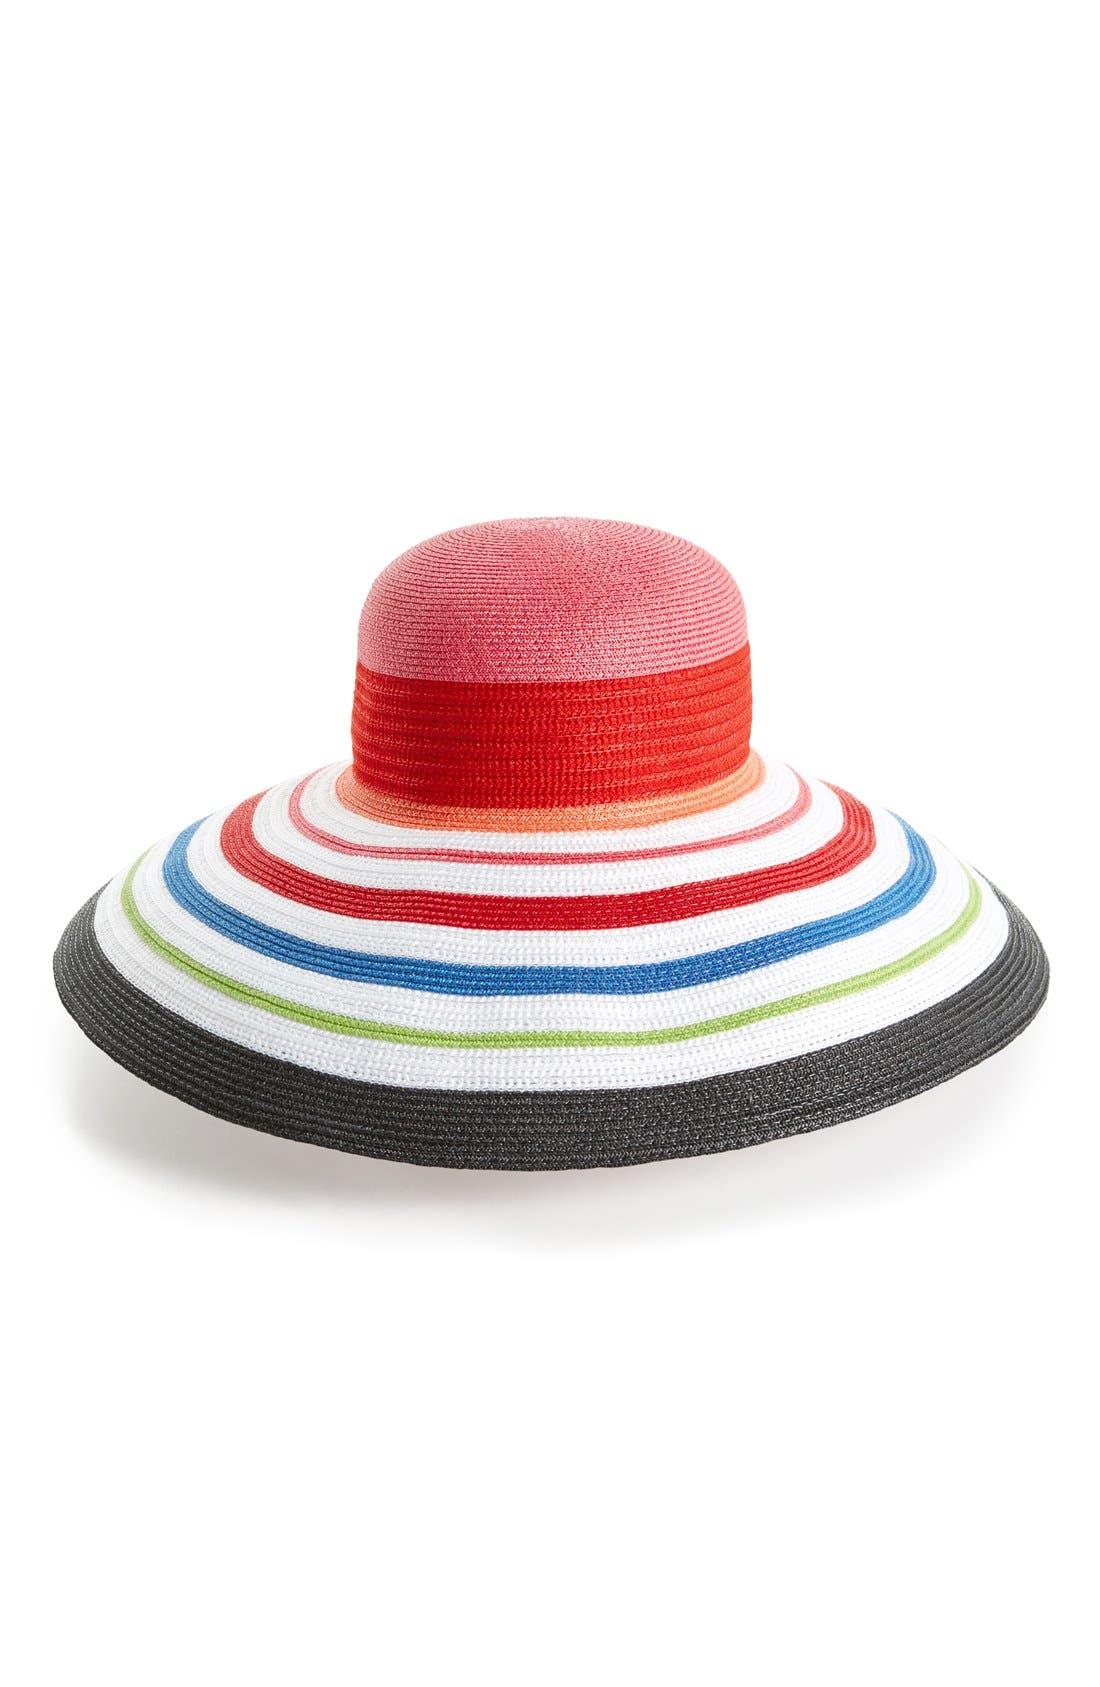 Main Image - Laundry by Shelli Segal 'Chloe' Floppy Hat